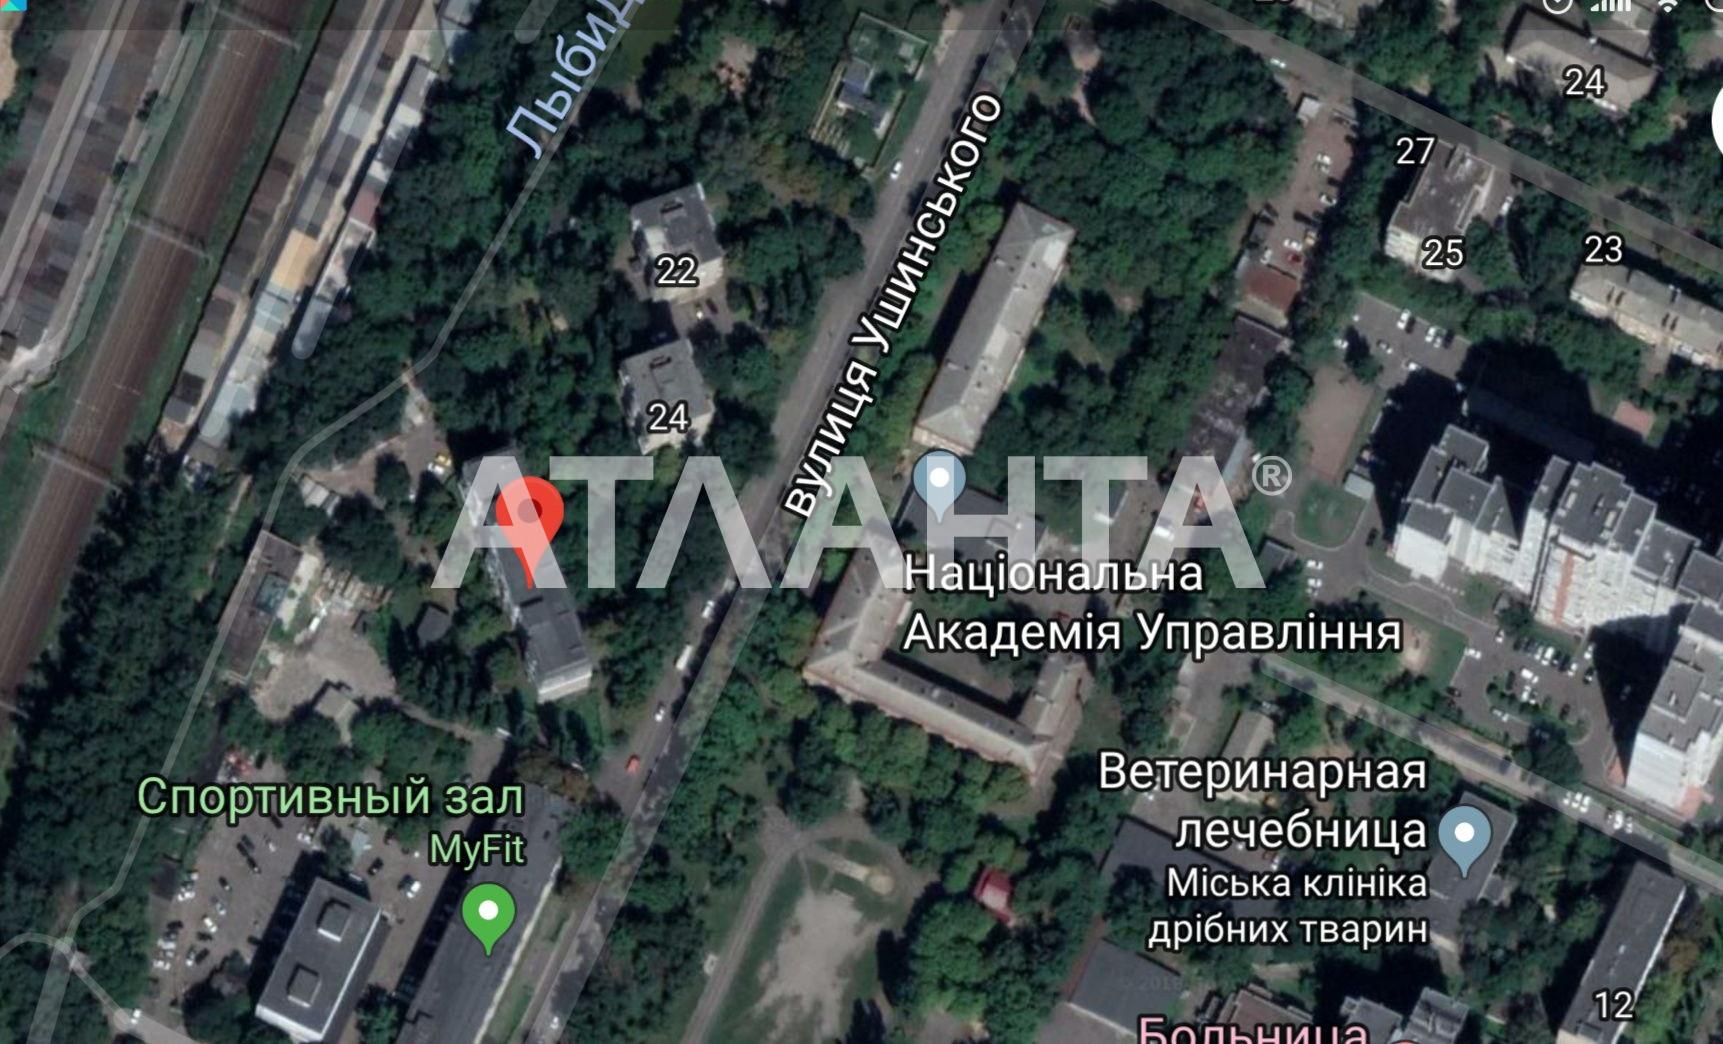 Продается 3-комнатная Квартира на ул. Ушинского — 45 500 у.е. (фото №12)